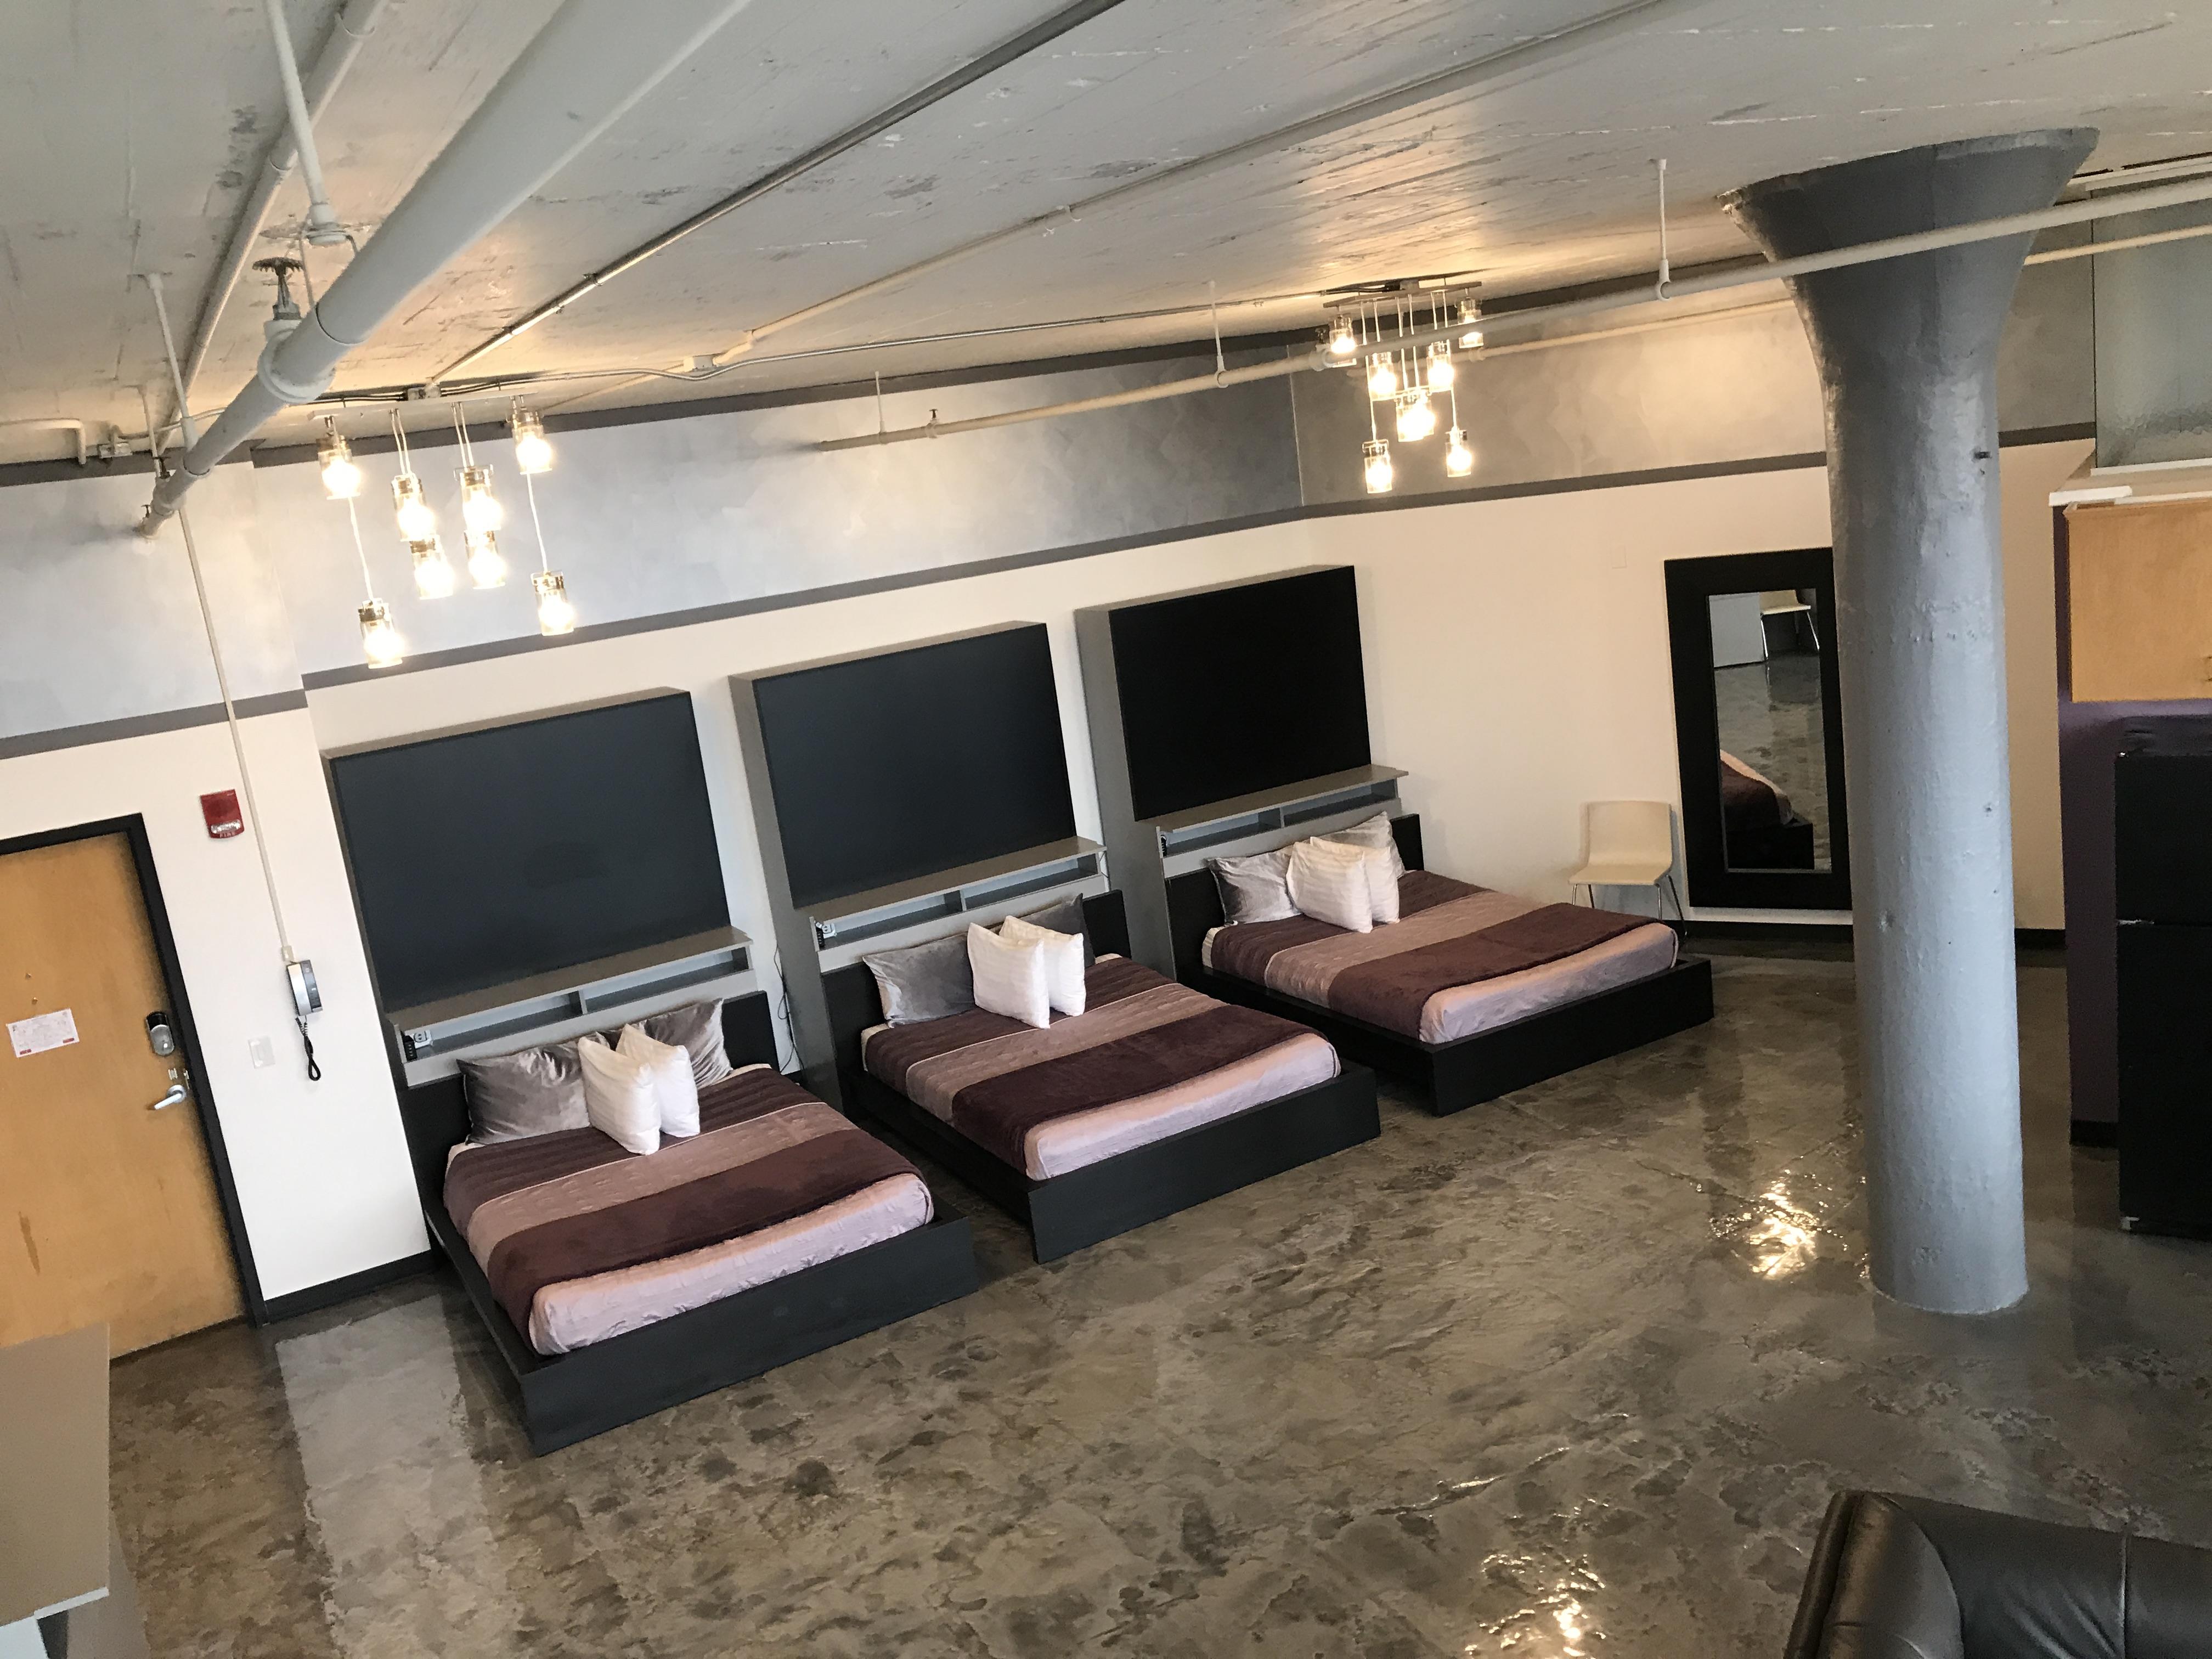 Loft Reverie Hotel 701 - Beds